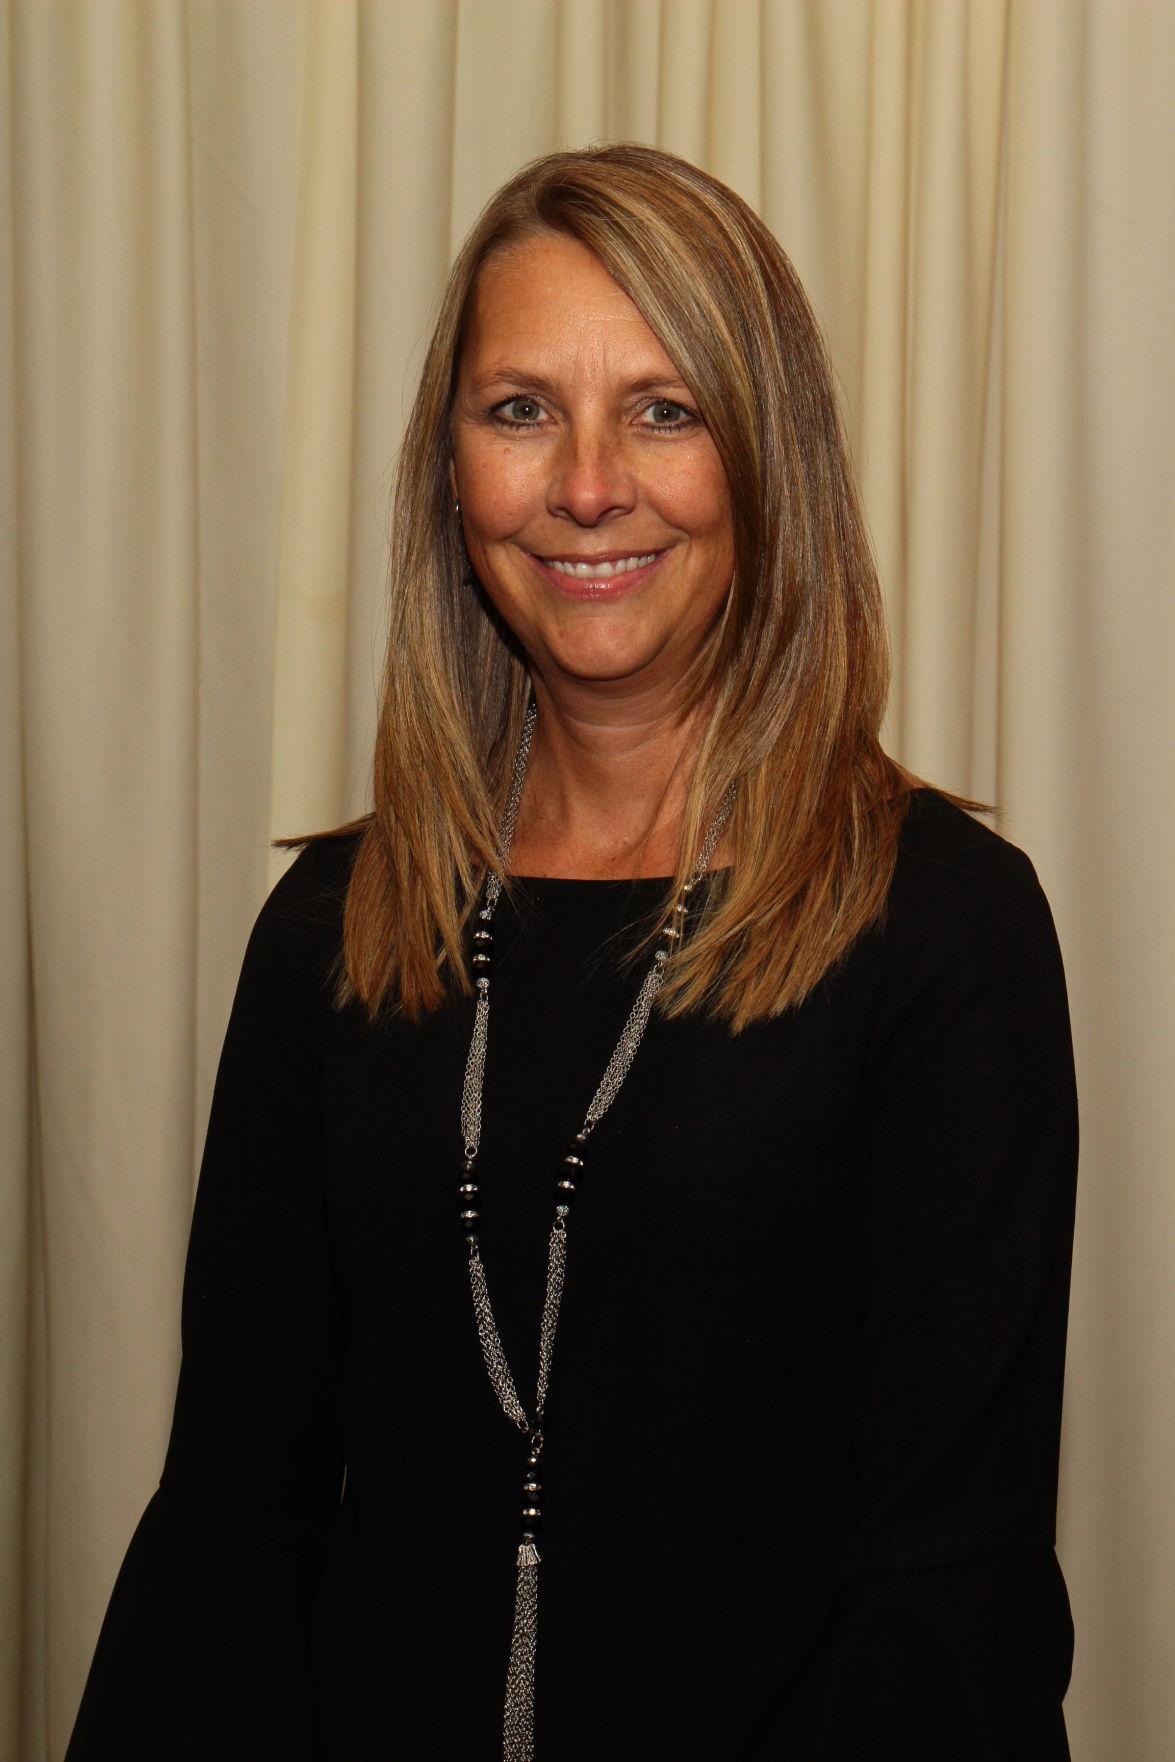 Patty Lansink